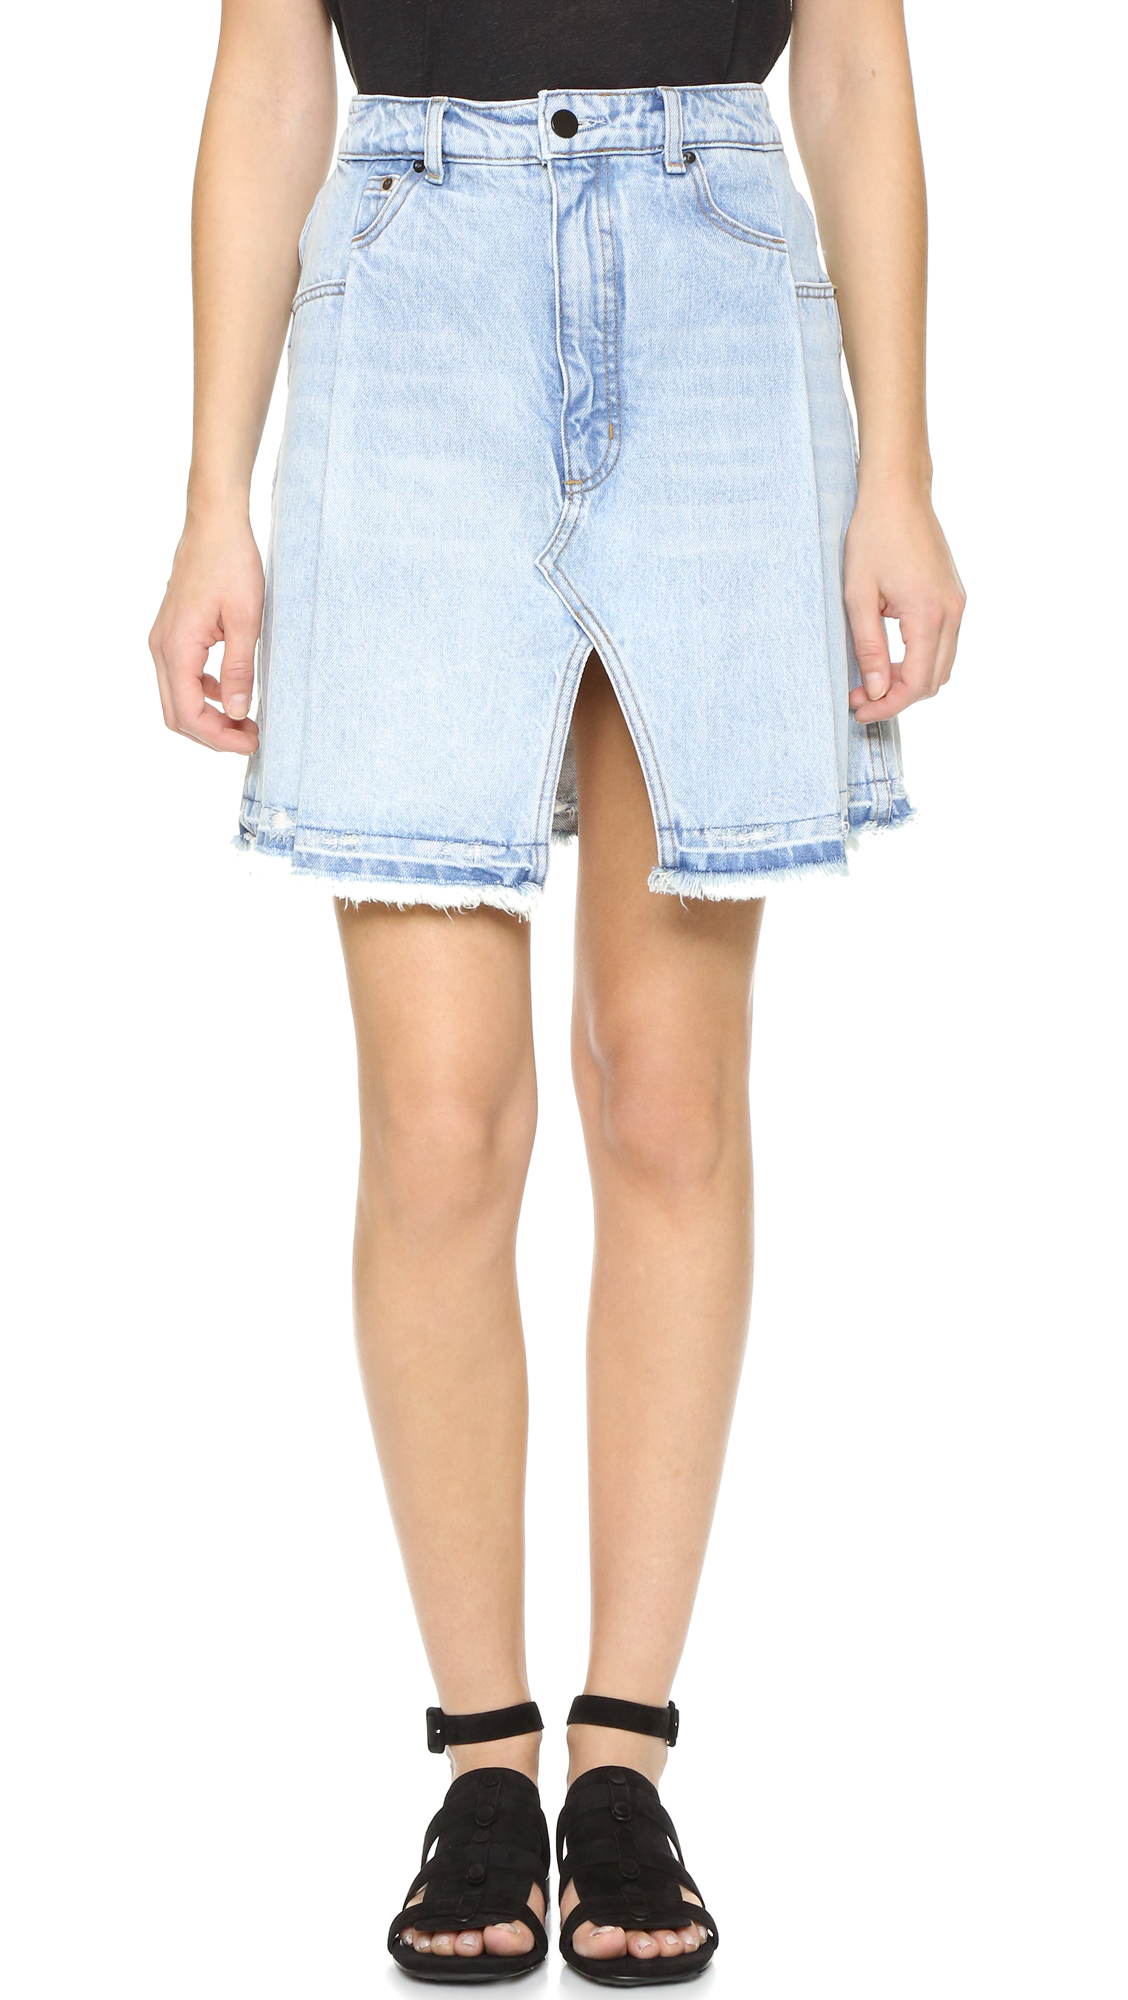 Alexander wang Pleated Miniskirt in Blue | Lyst